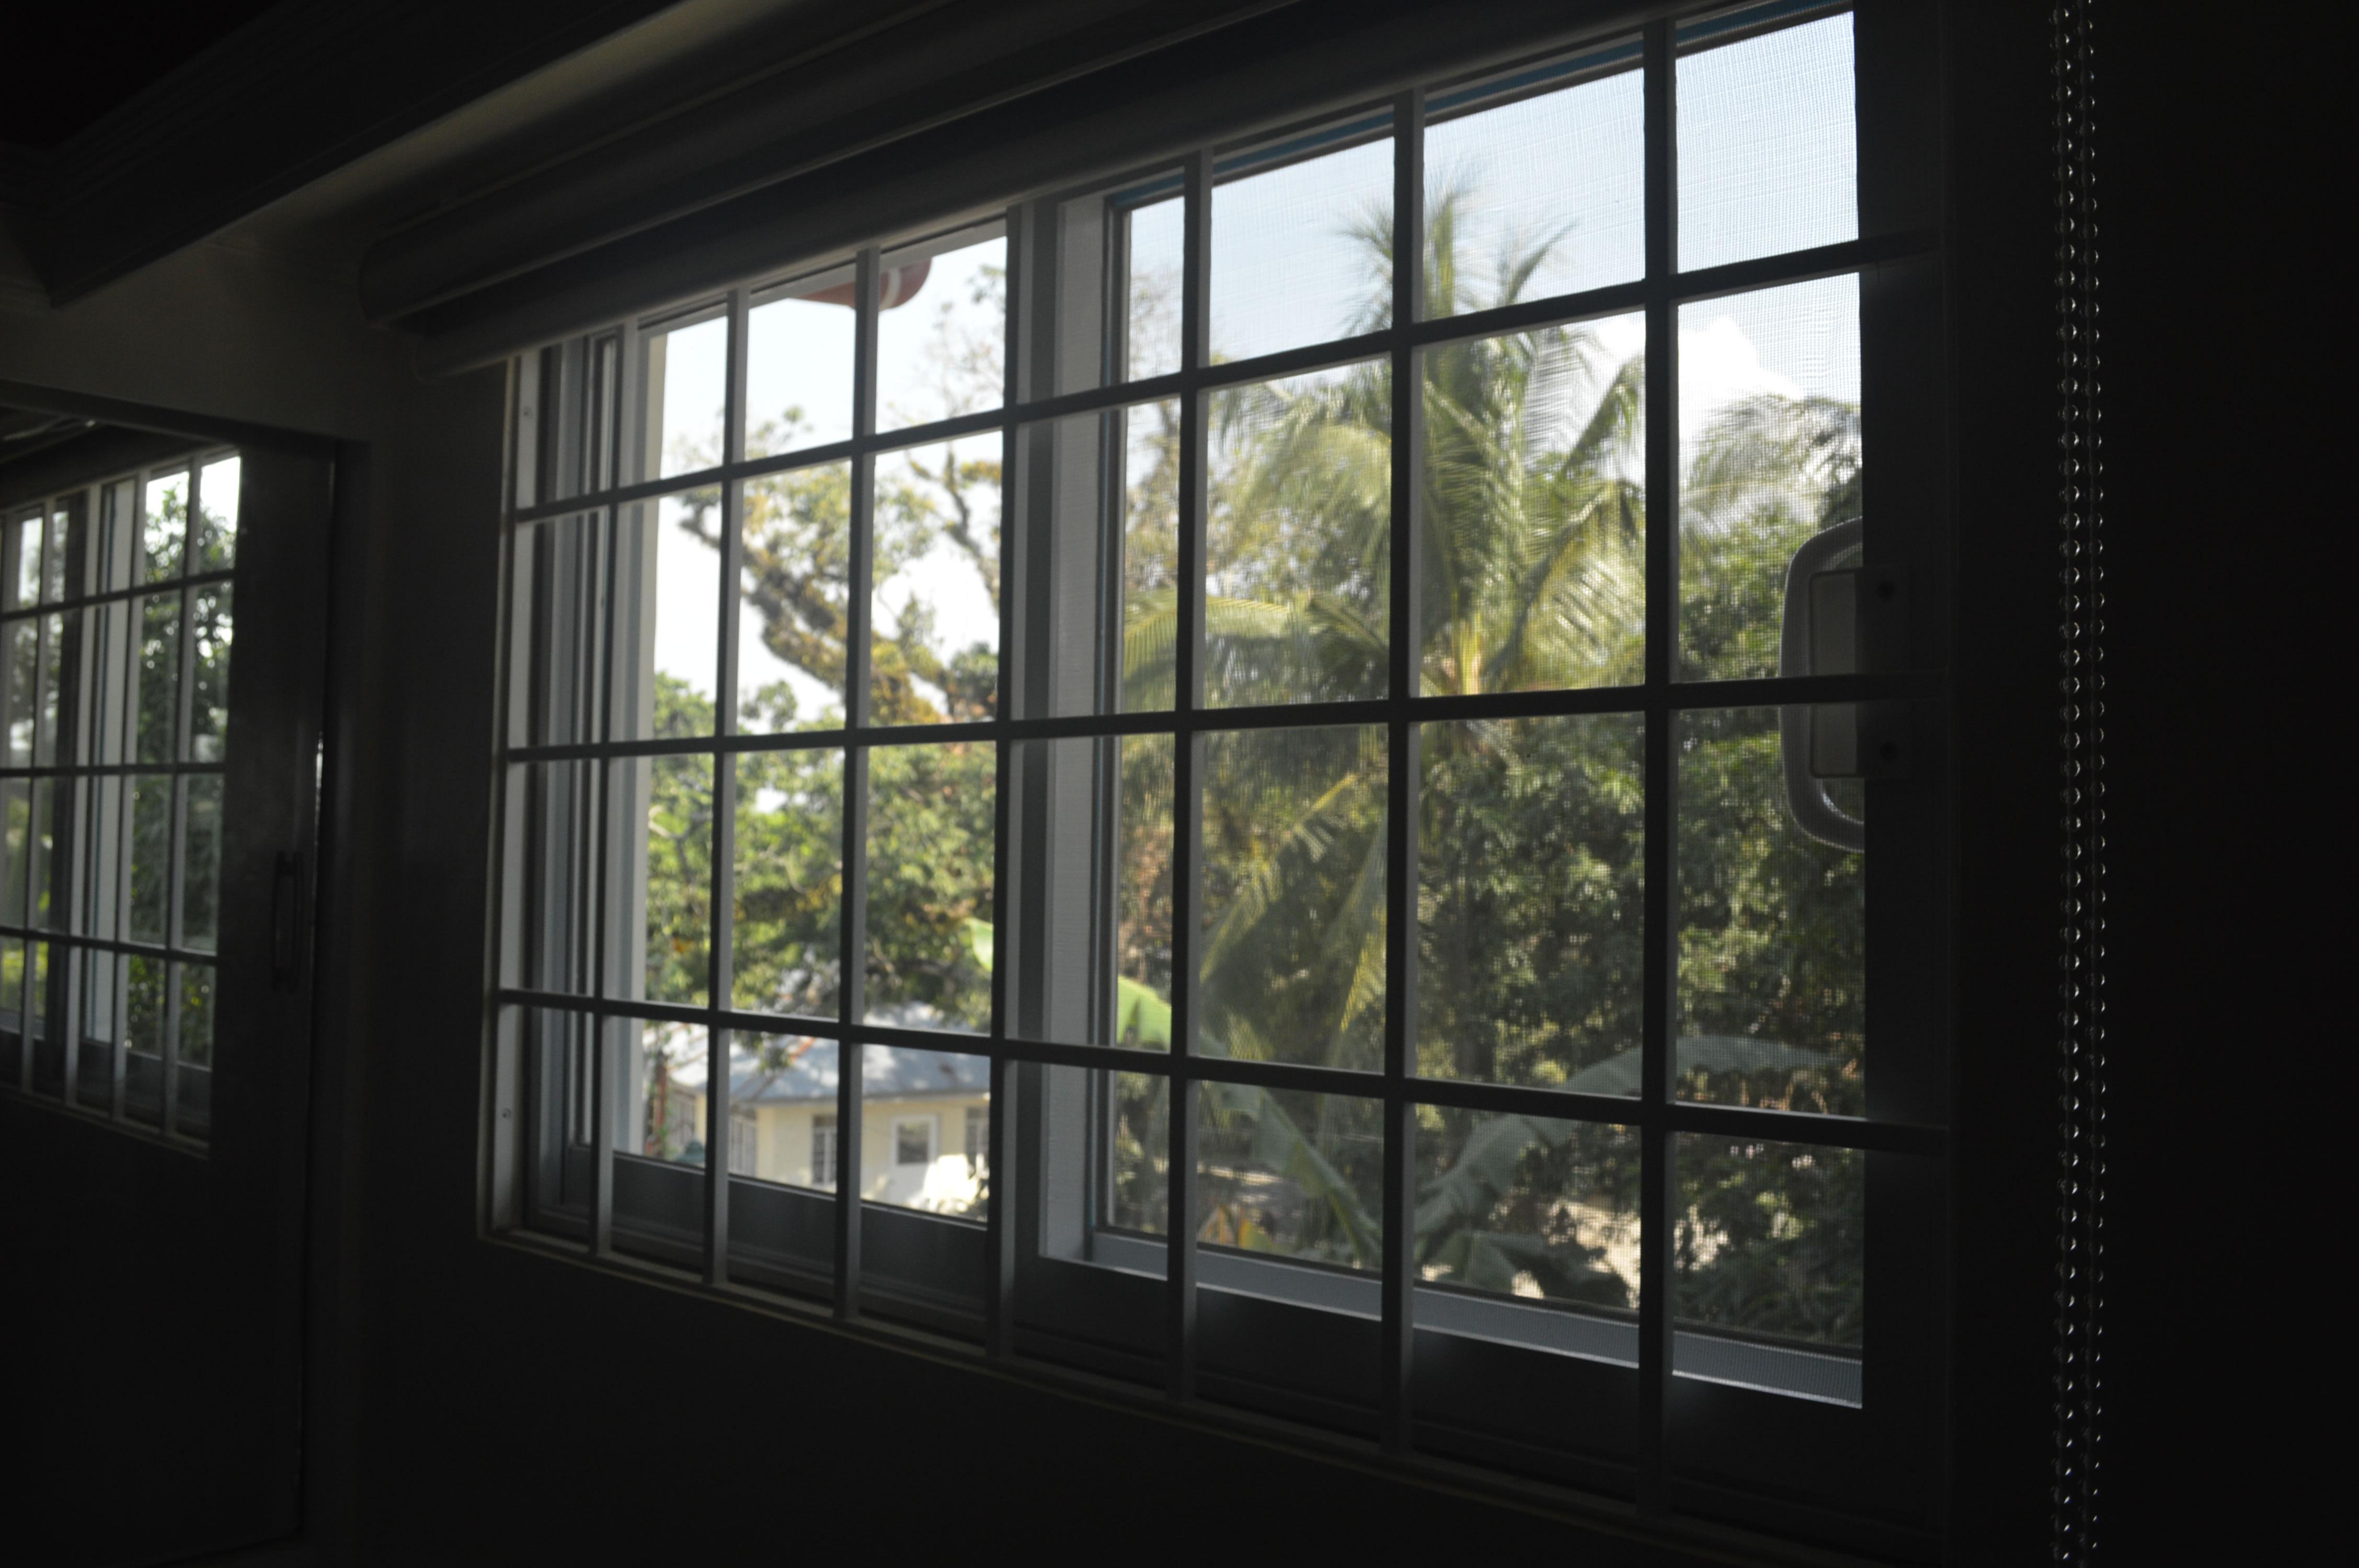 House Window Grill Design Catalogue | Zion Modern House